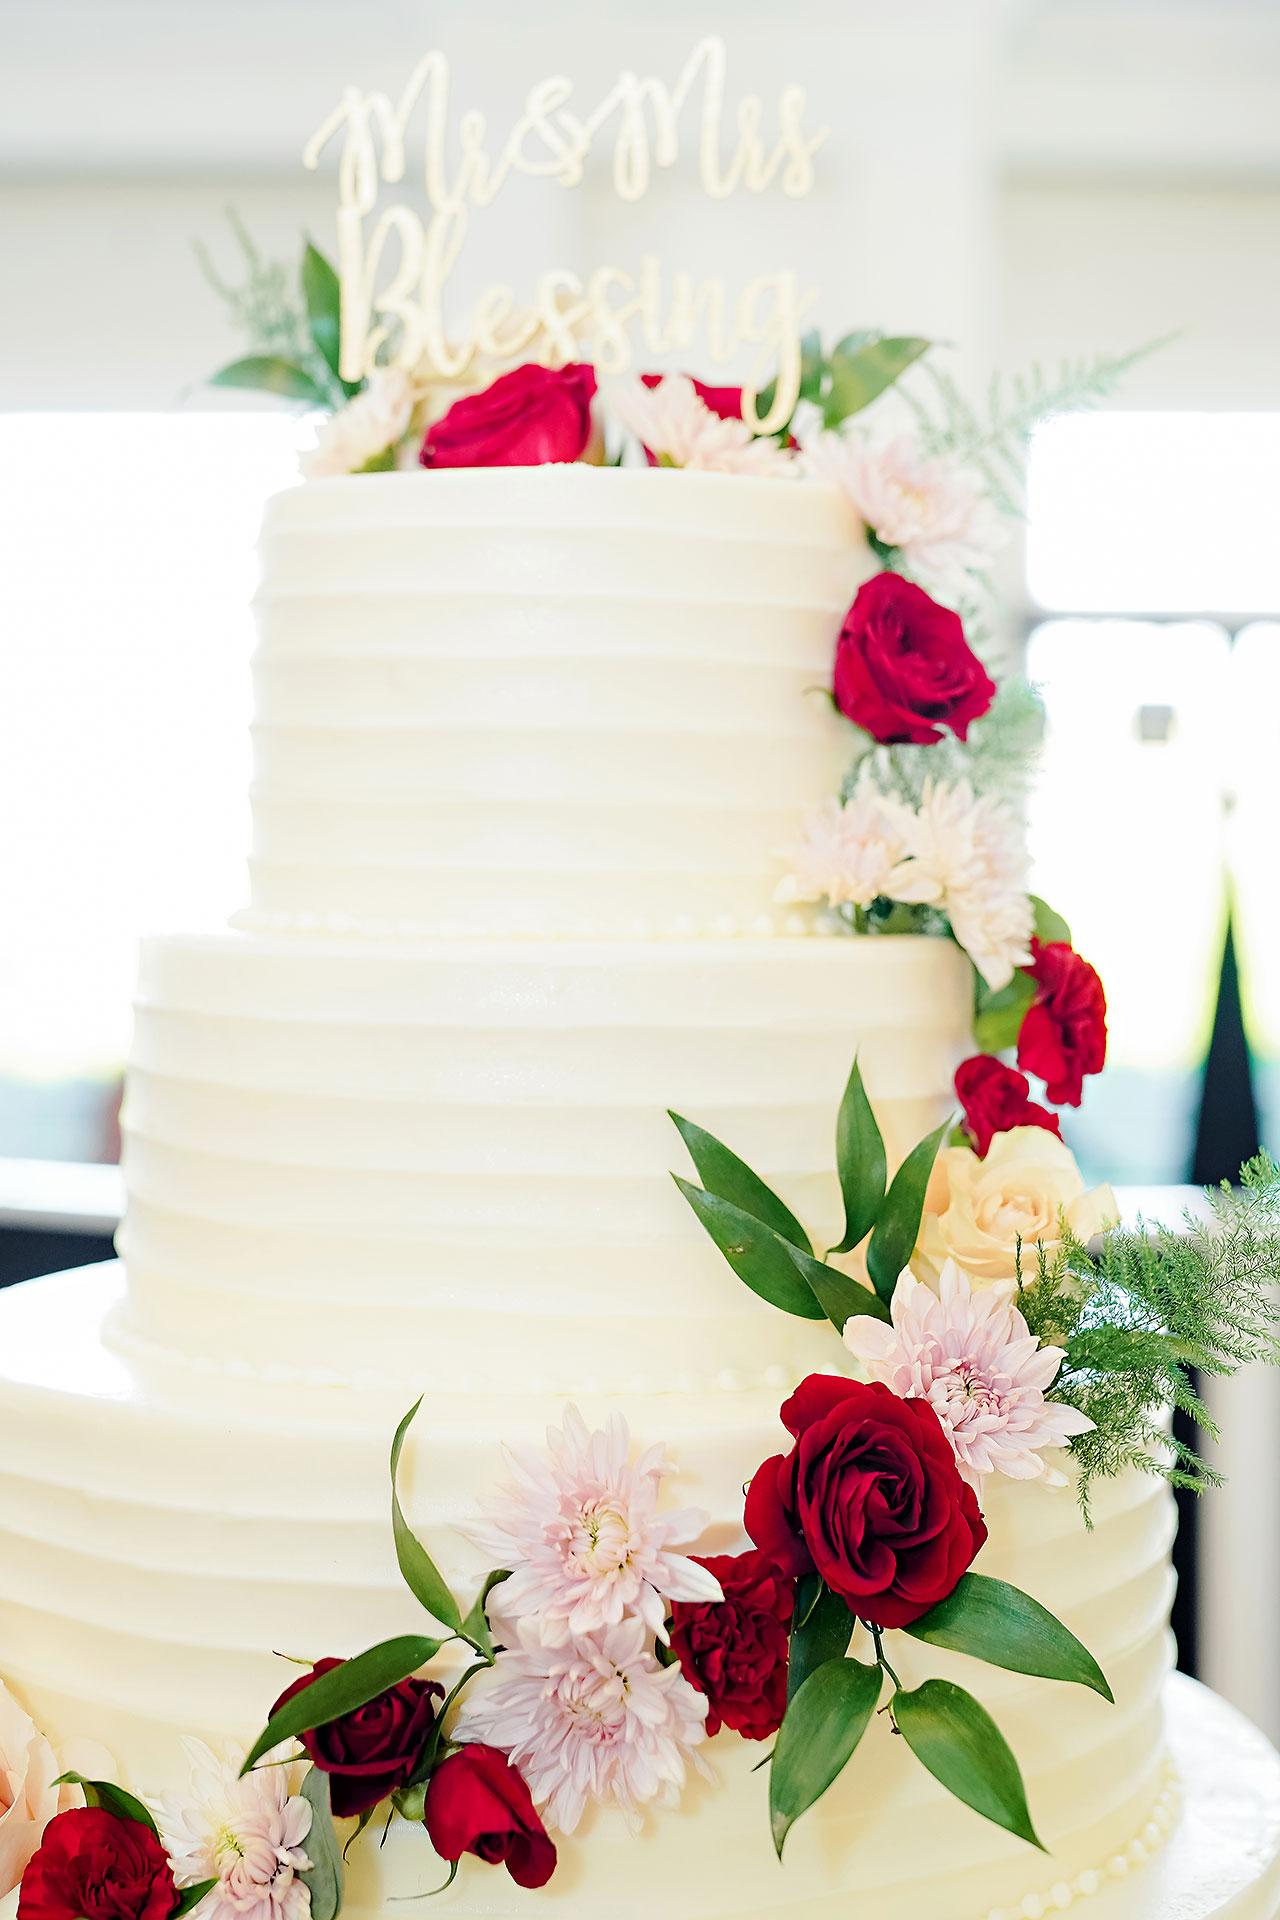 Nadia Parker Black Iris Estate Carmel Indiana Wedding May 2021 229